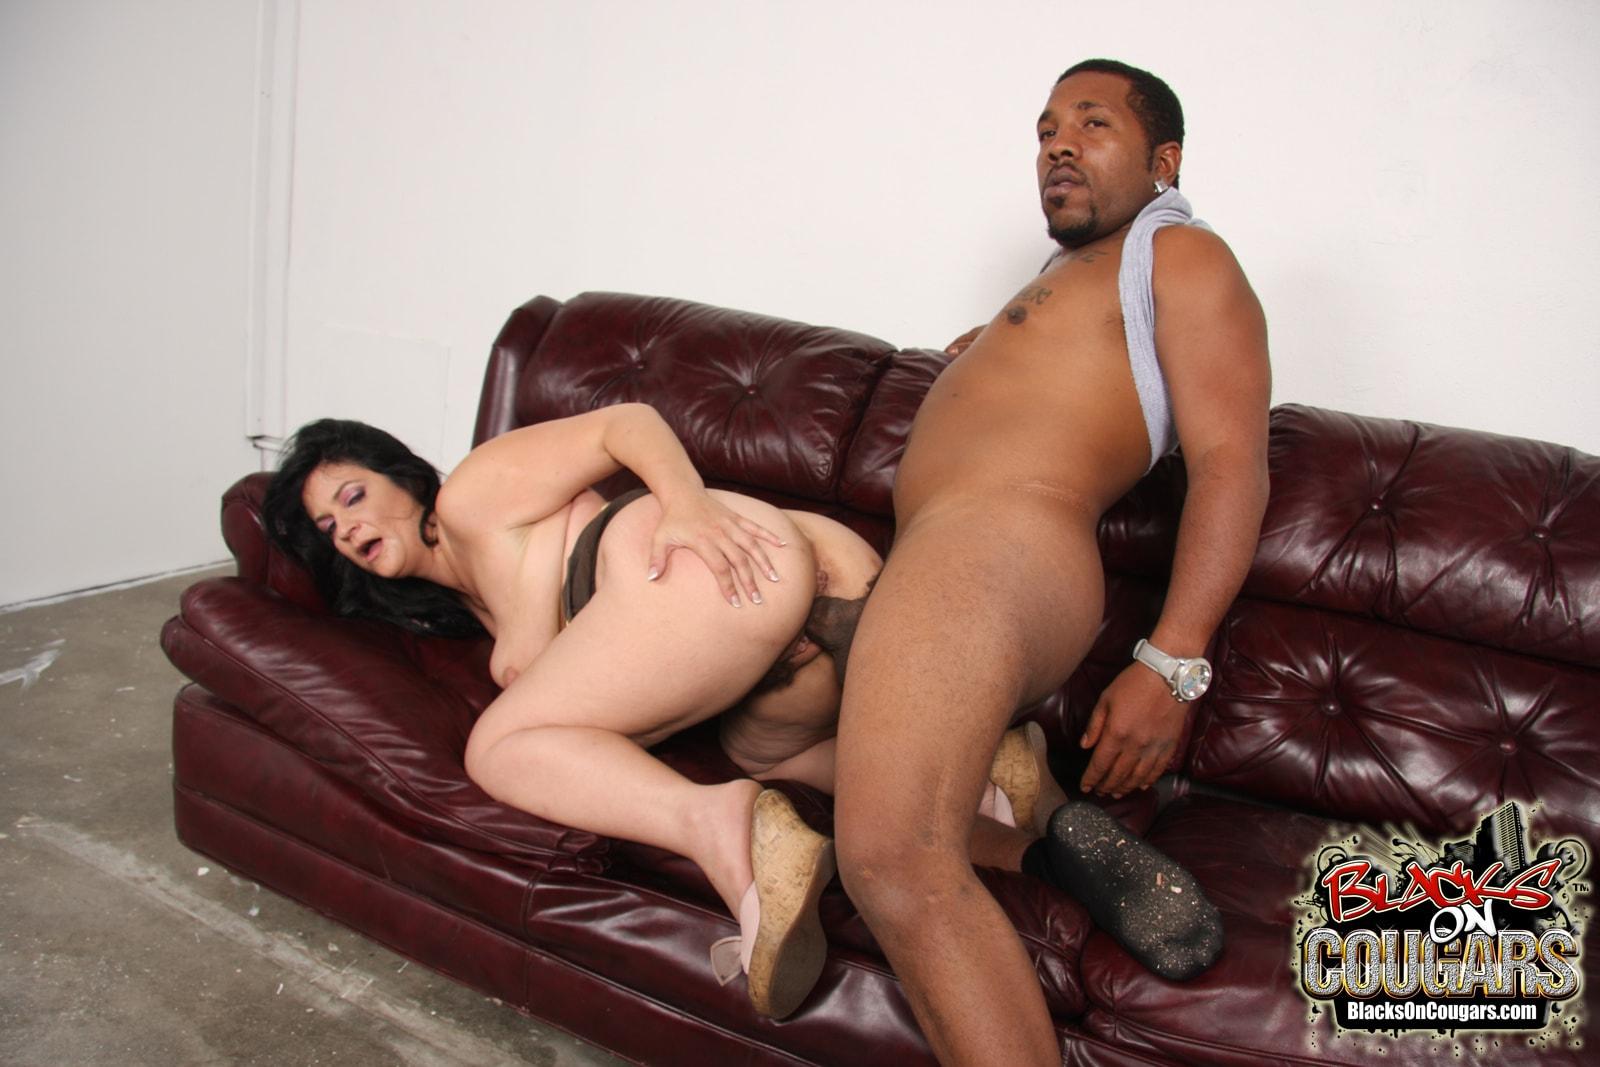 Dogfart '- Blacks On Cougars' starring Slut Deb (Photo 22)